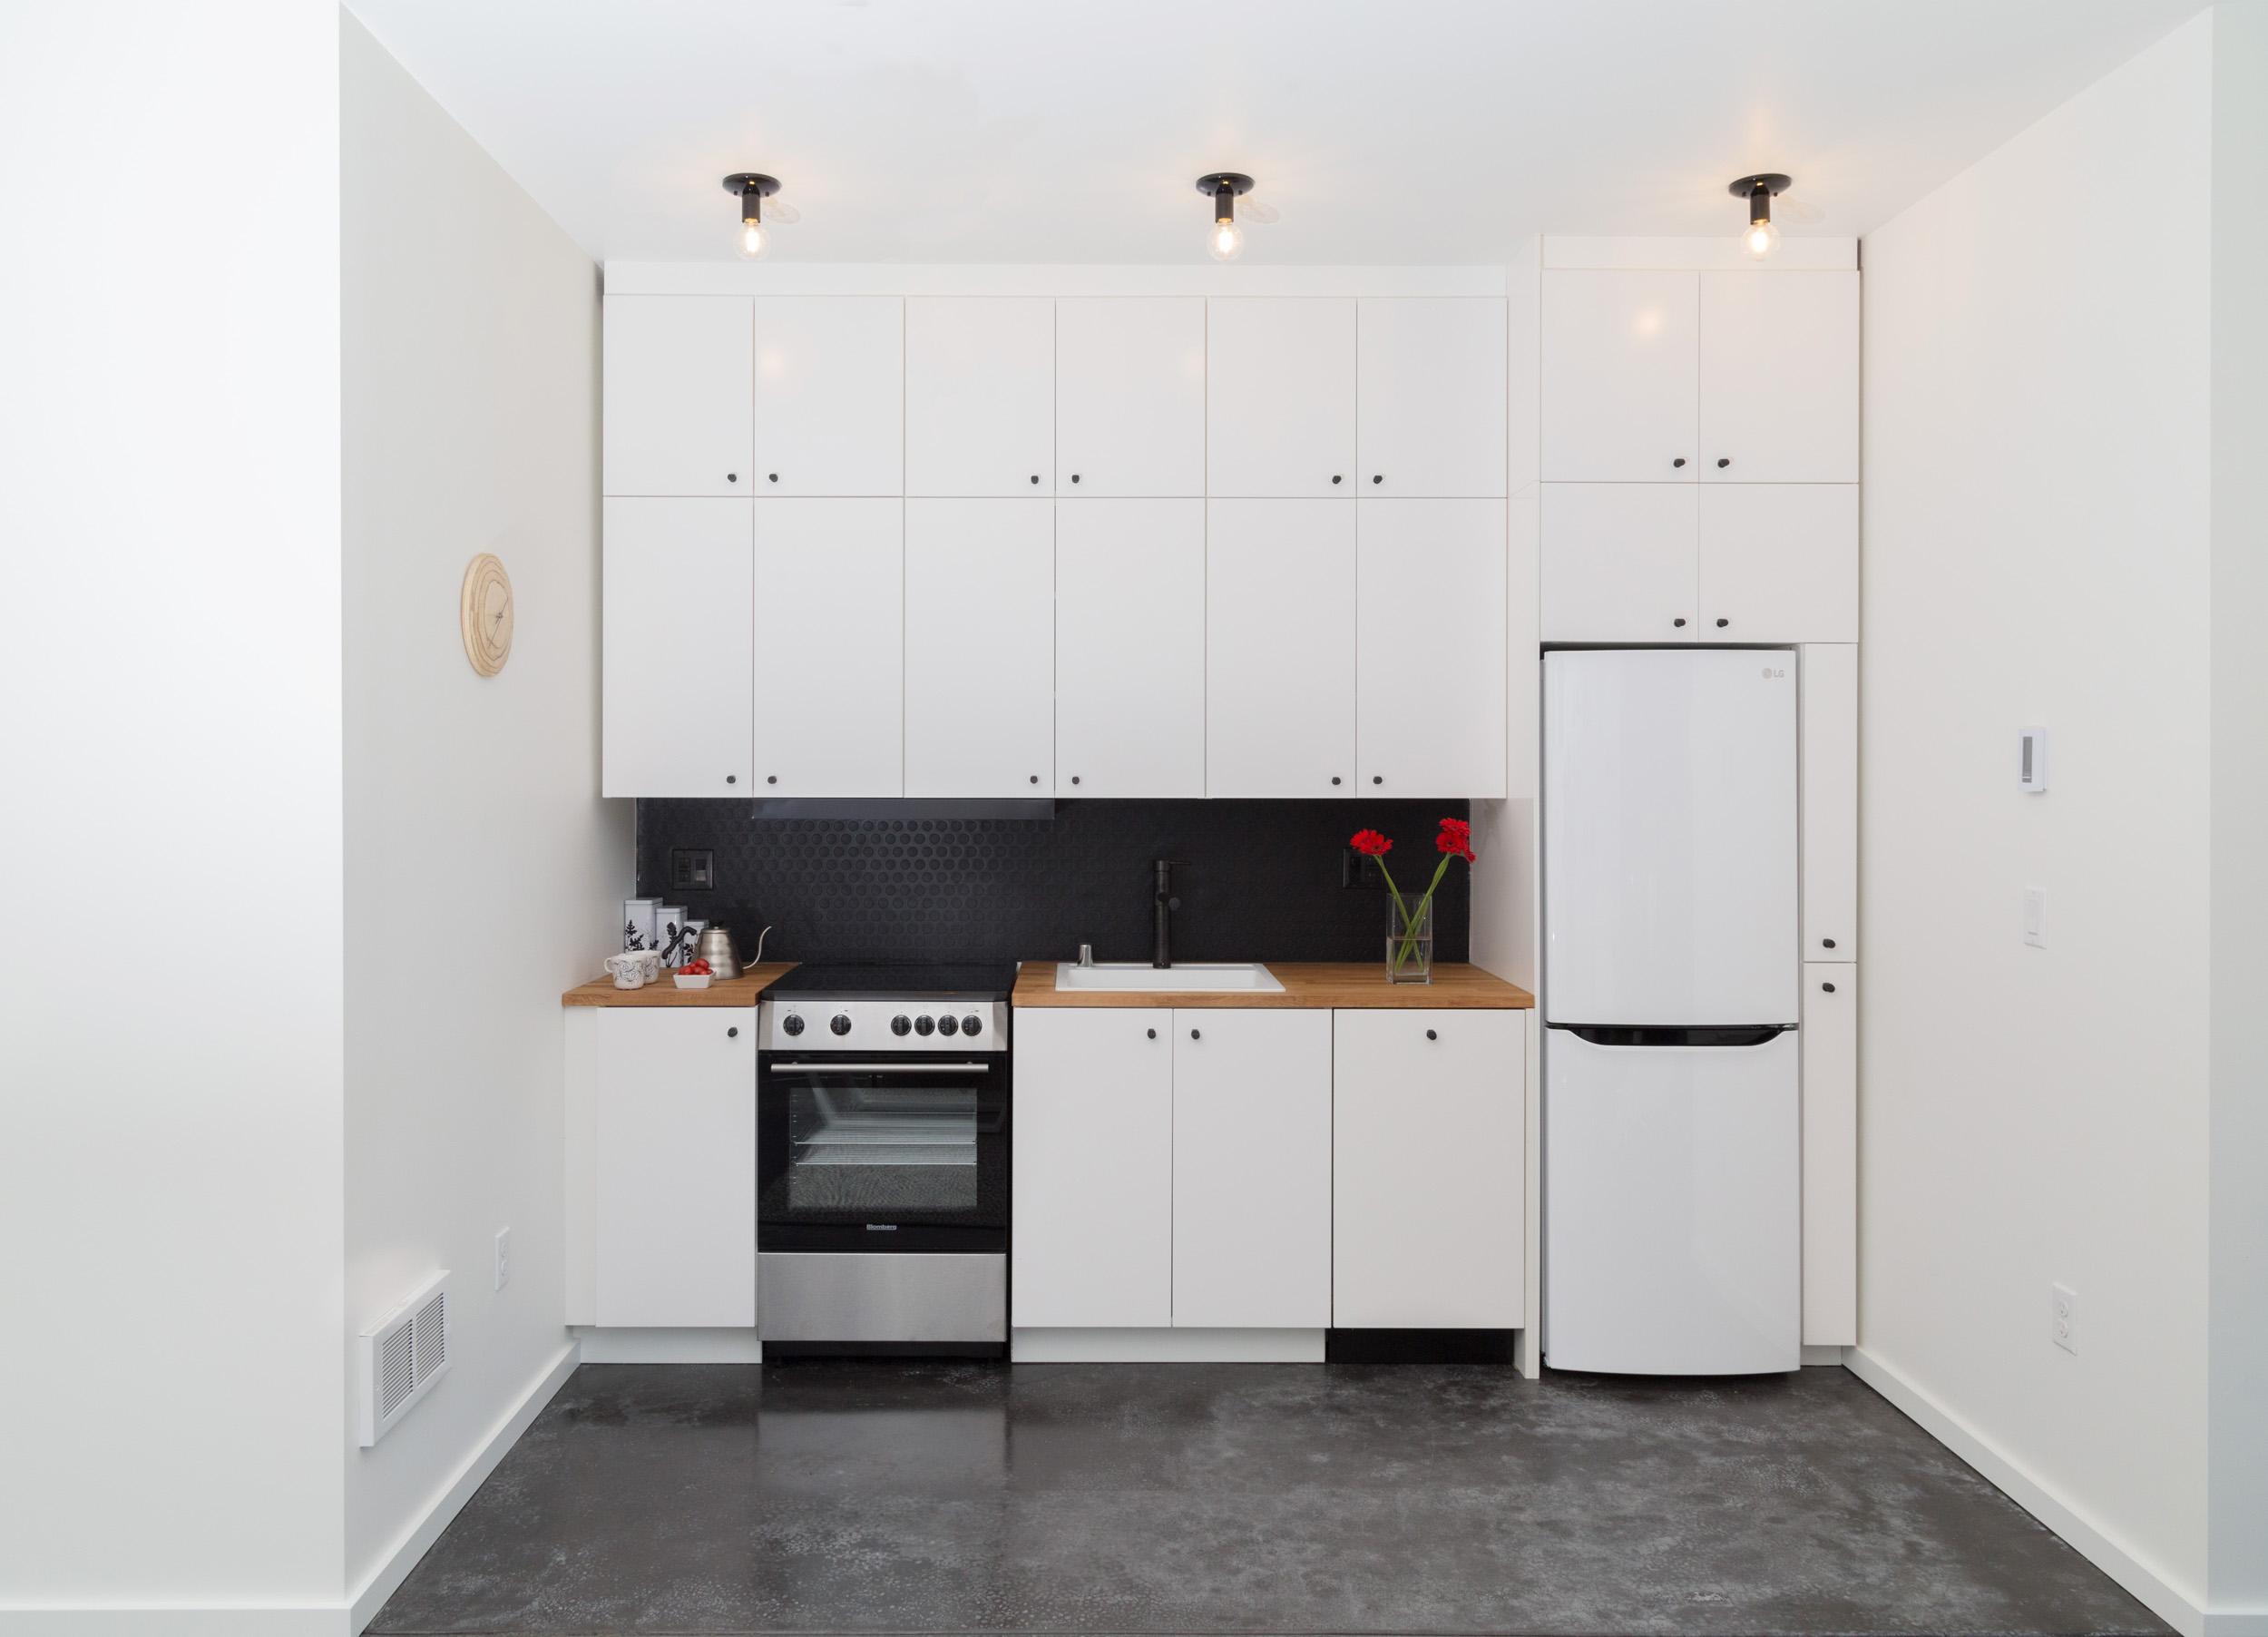 WC-STUDIO-PROSPECT-KITCHEN-WHITE-CABINETS-BLACK-CONCRETE-FLOORS-BUTCHER-BLOCK-COUNTERTOP.jpg